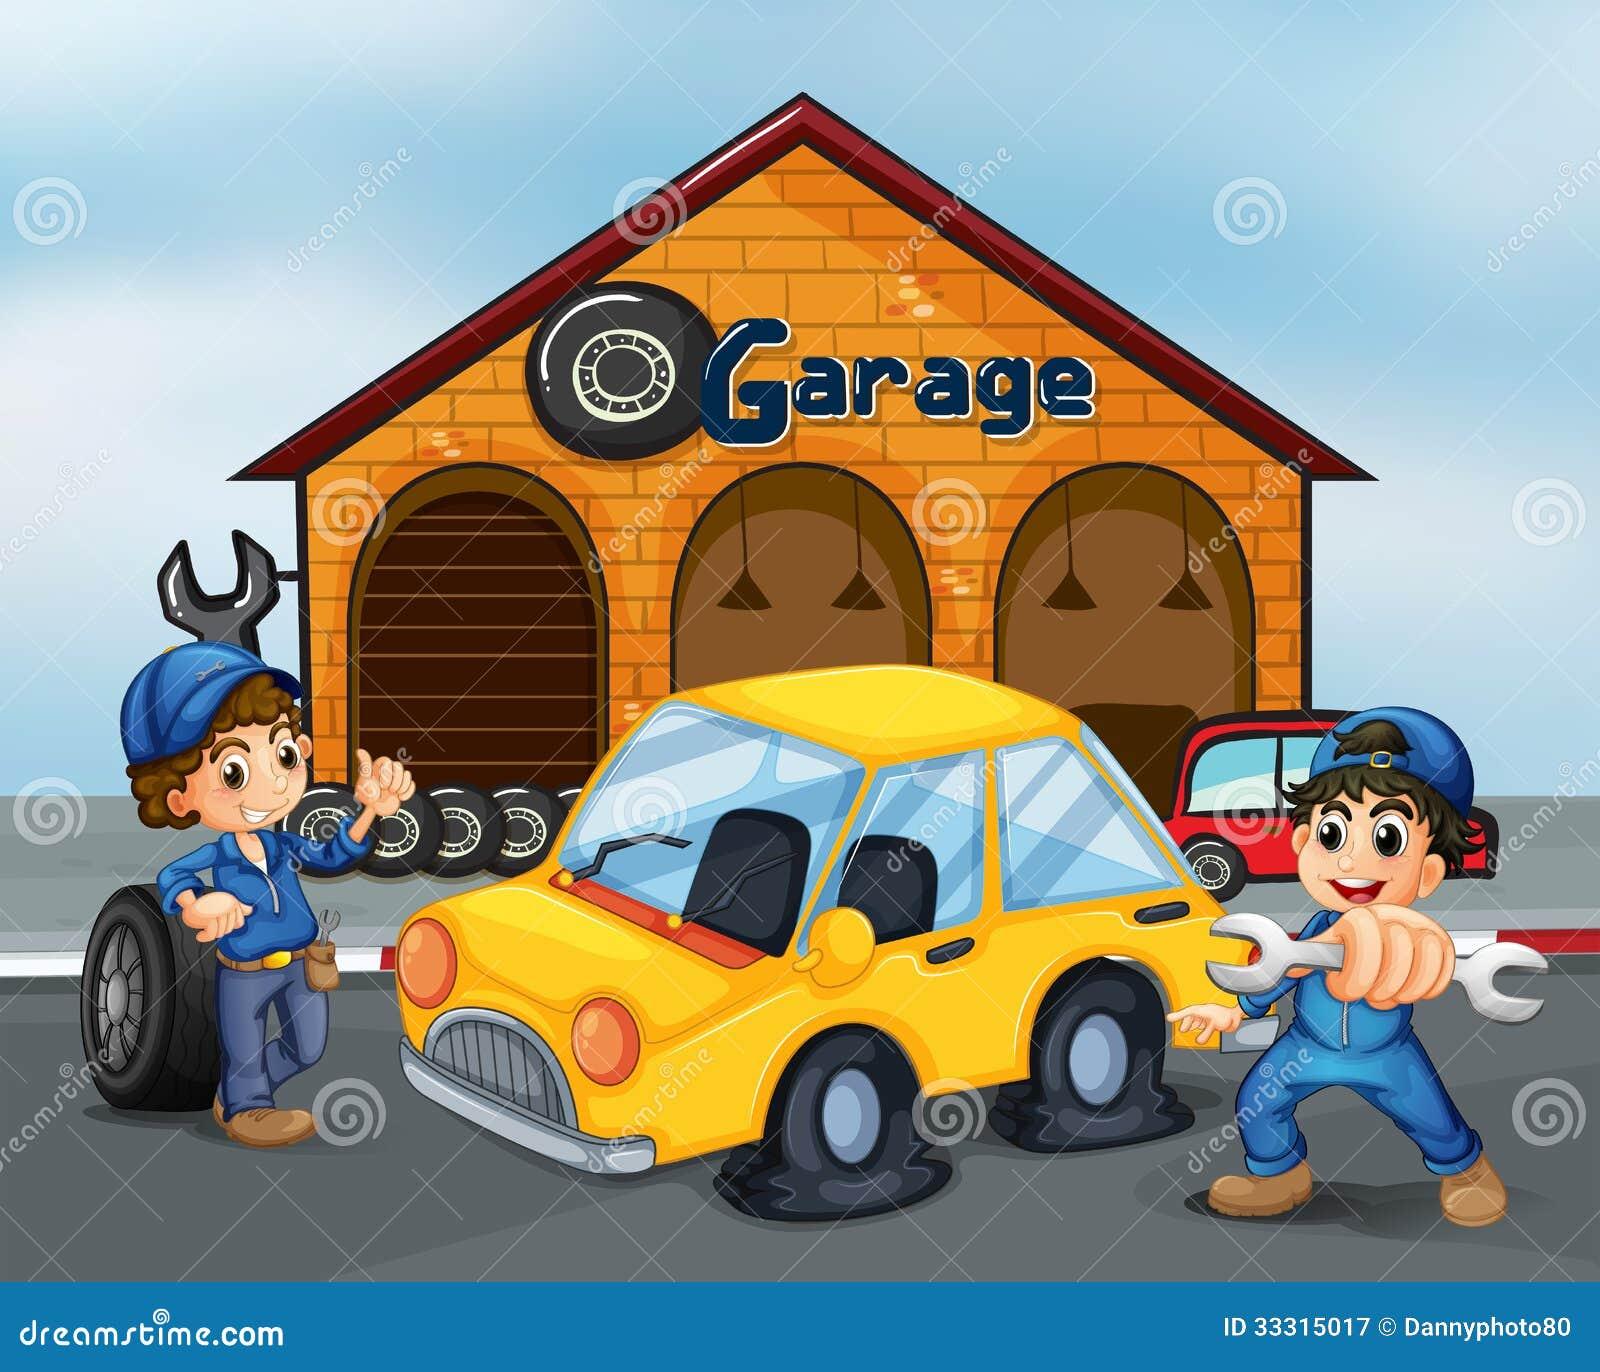 Gentleman S Garage : Two gentlemen with tools at the garage royalty free stock